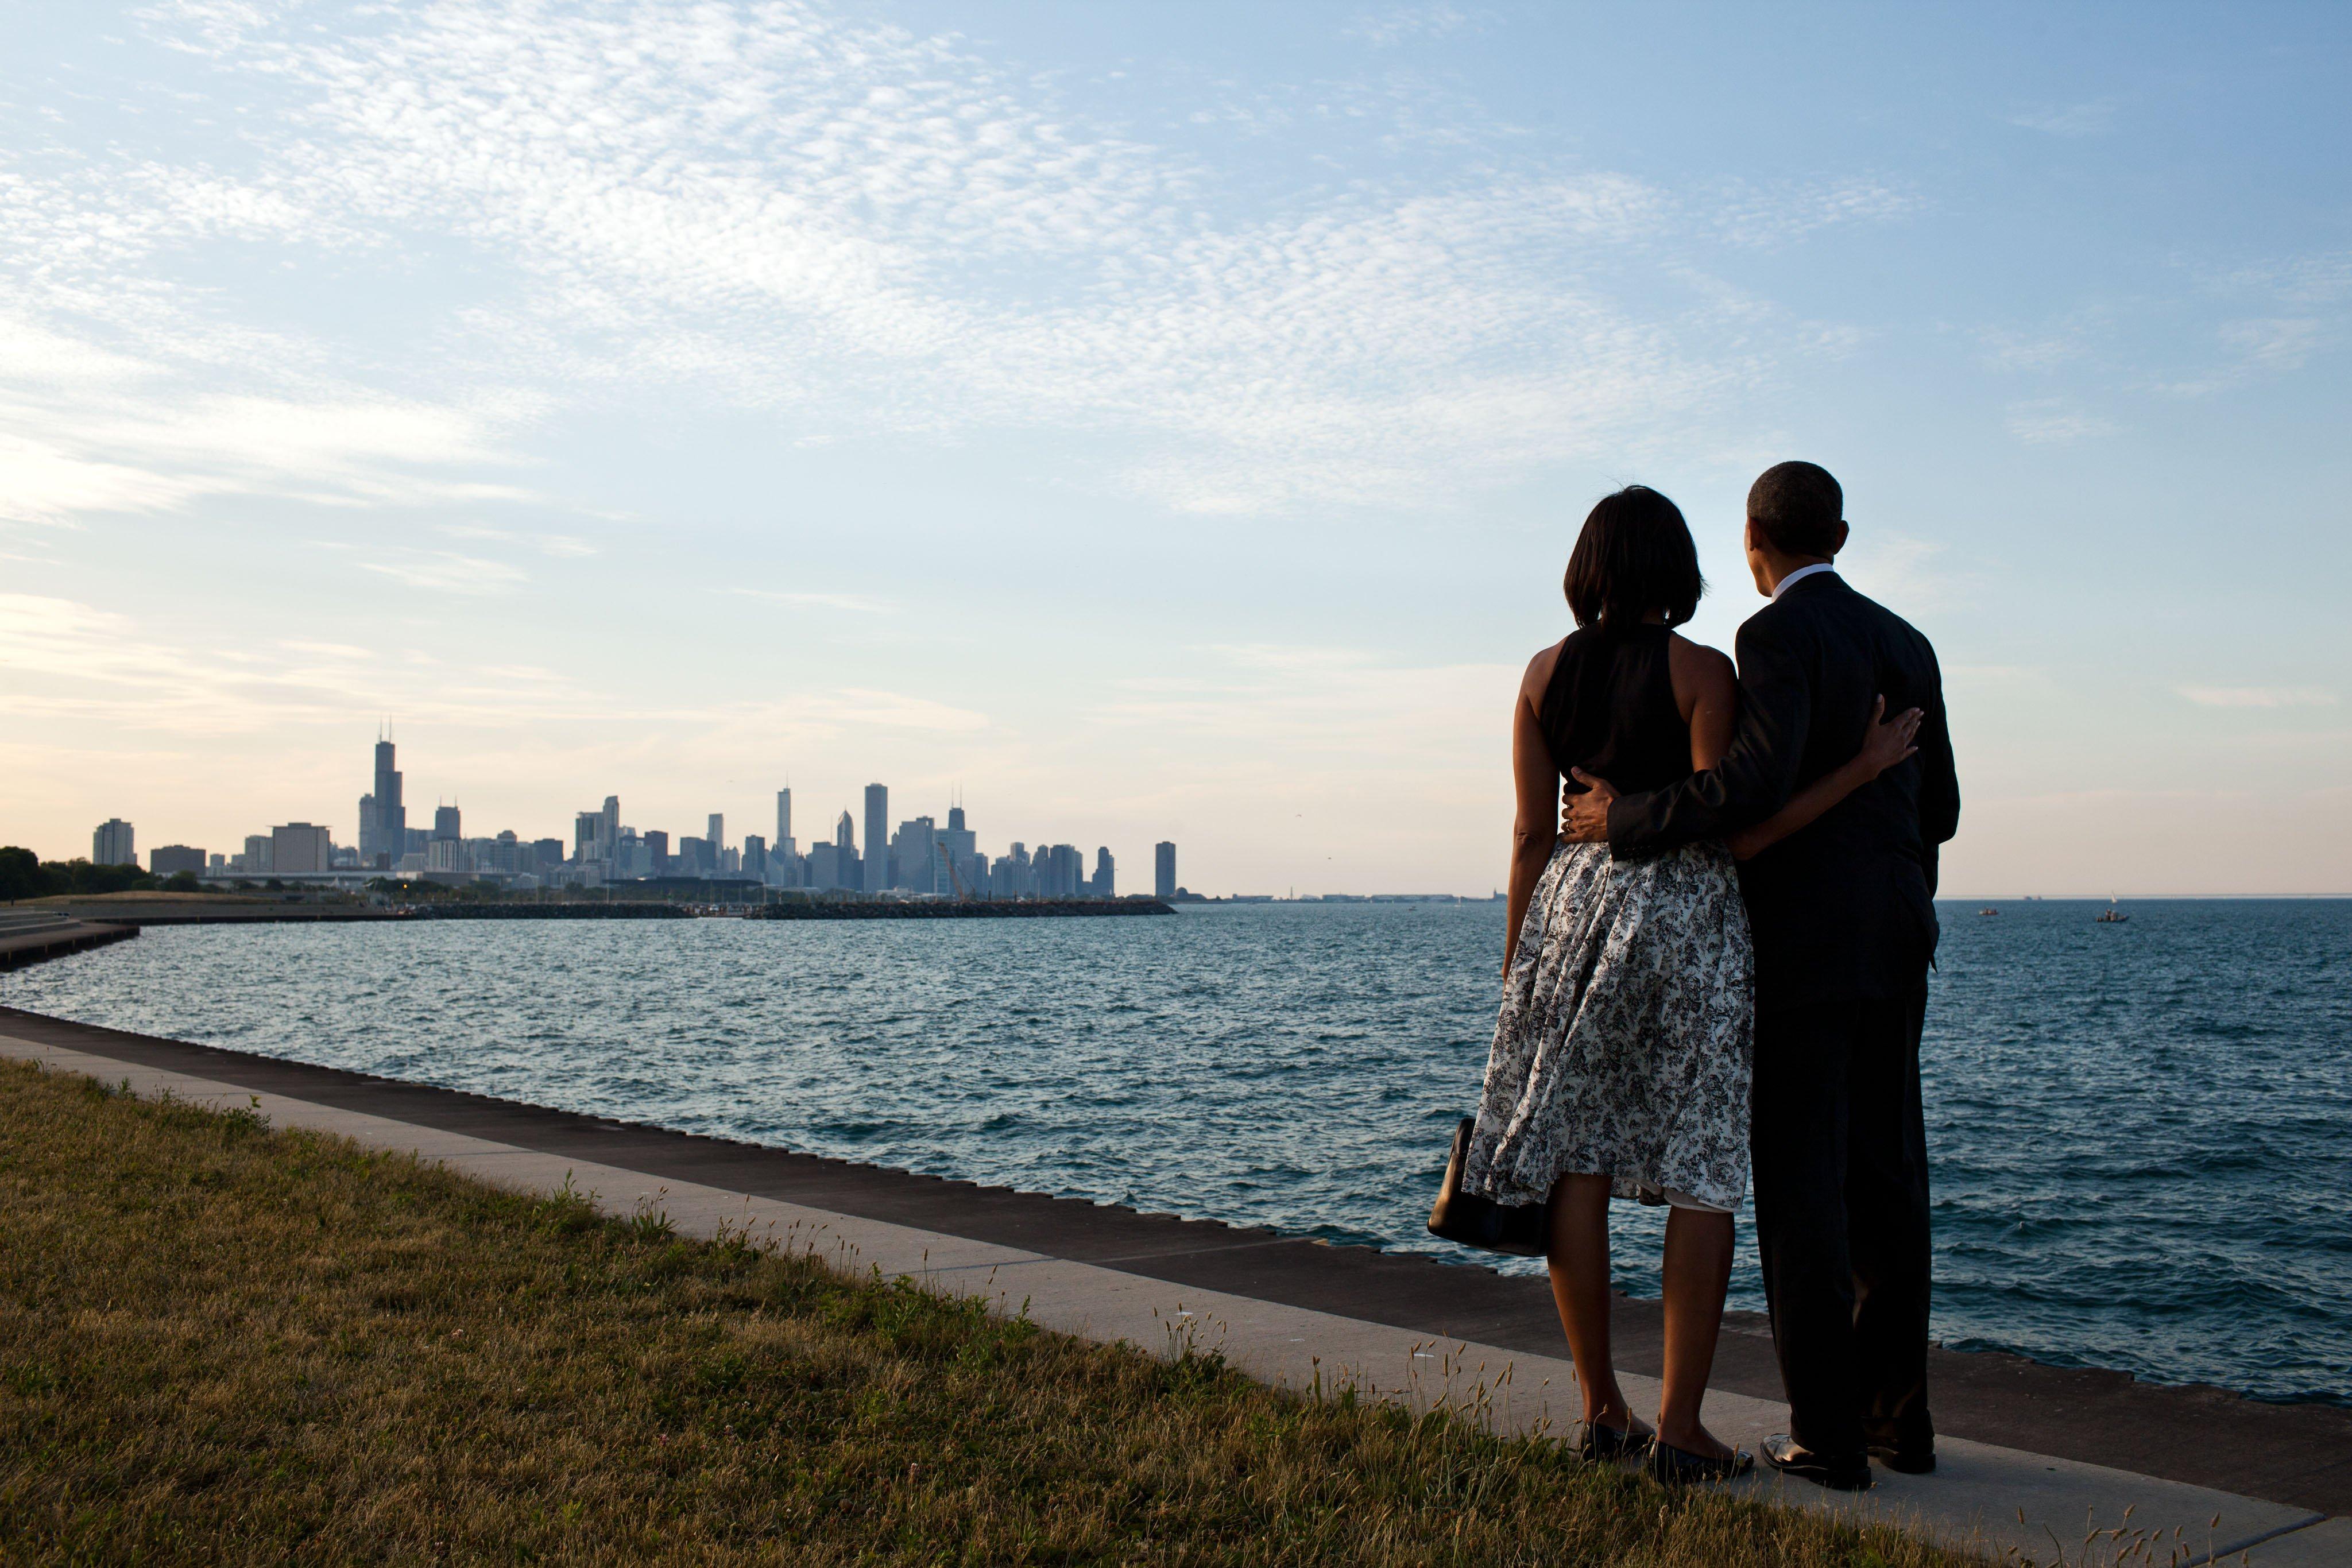 Barack_Obama_Birthday_FINALS_037.jpg